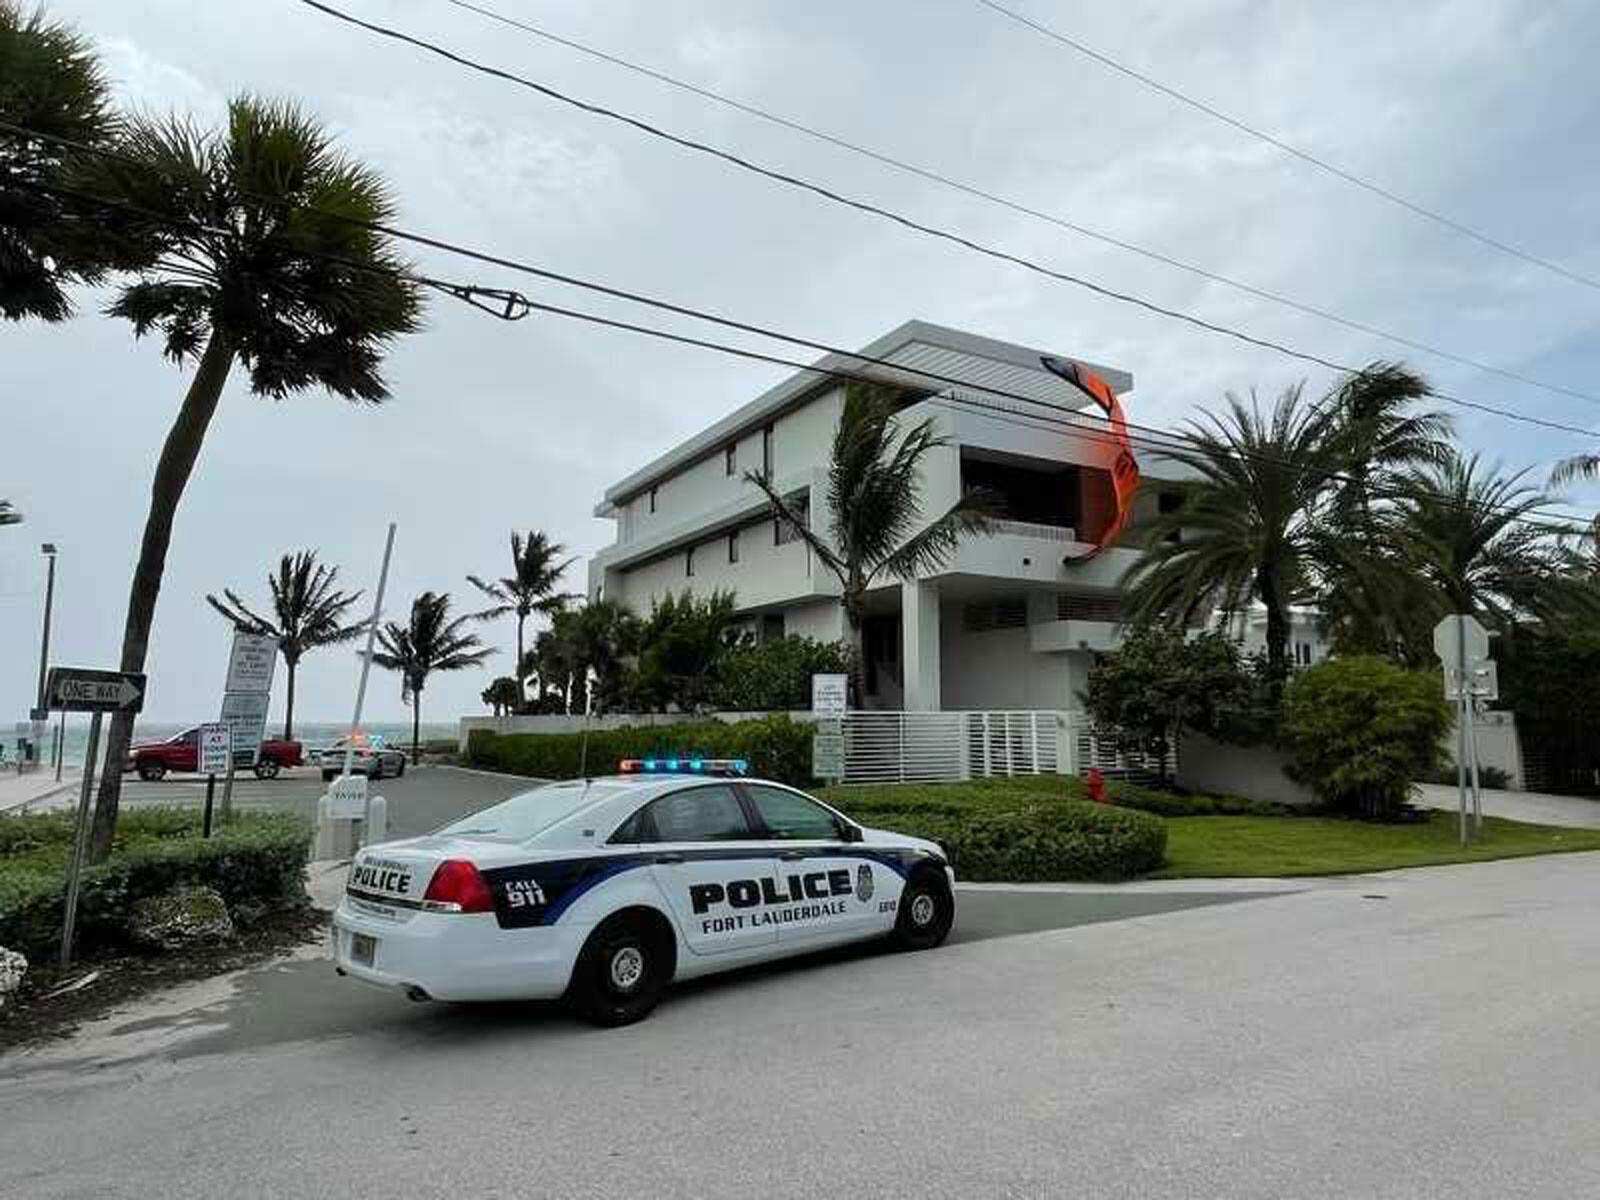 Kite surfer dies after slamming into Fort Lauderdale home